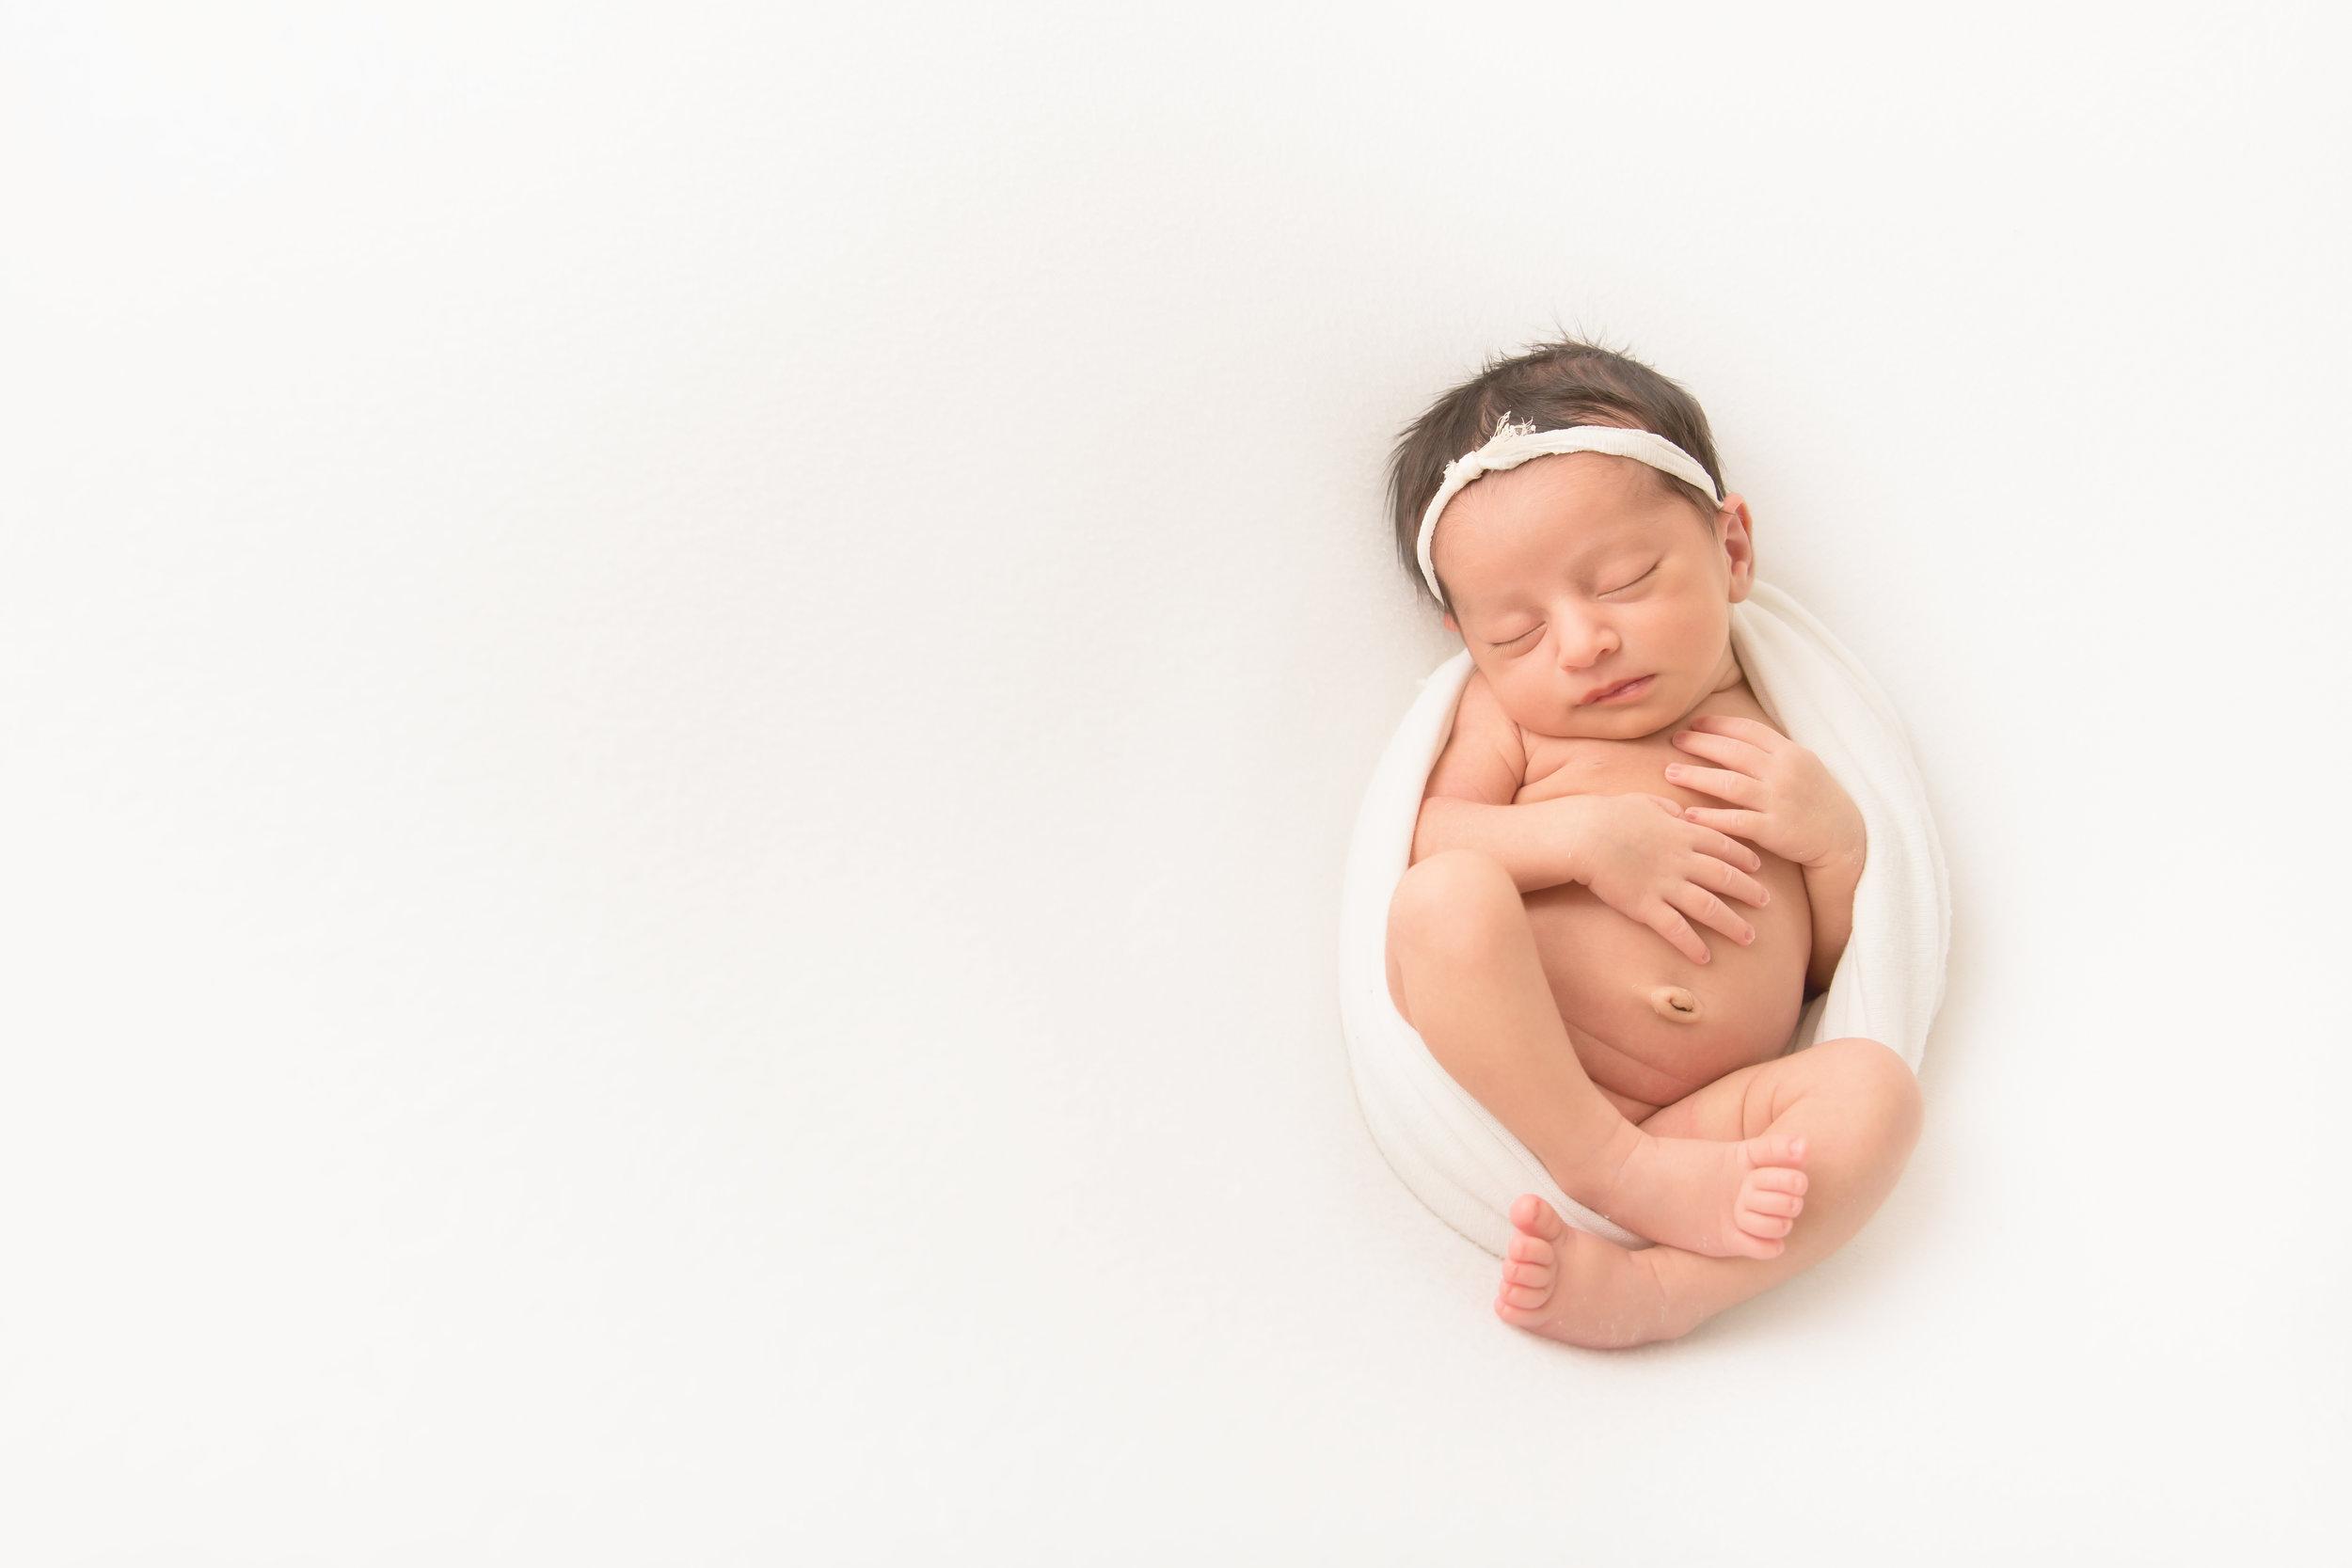 nj-newborn-photography-light-airy